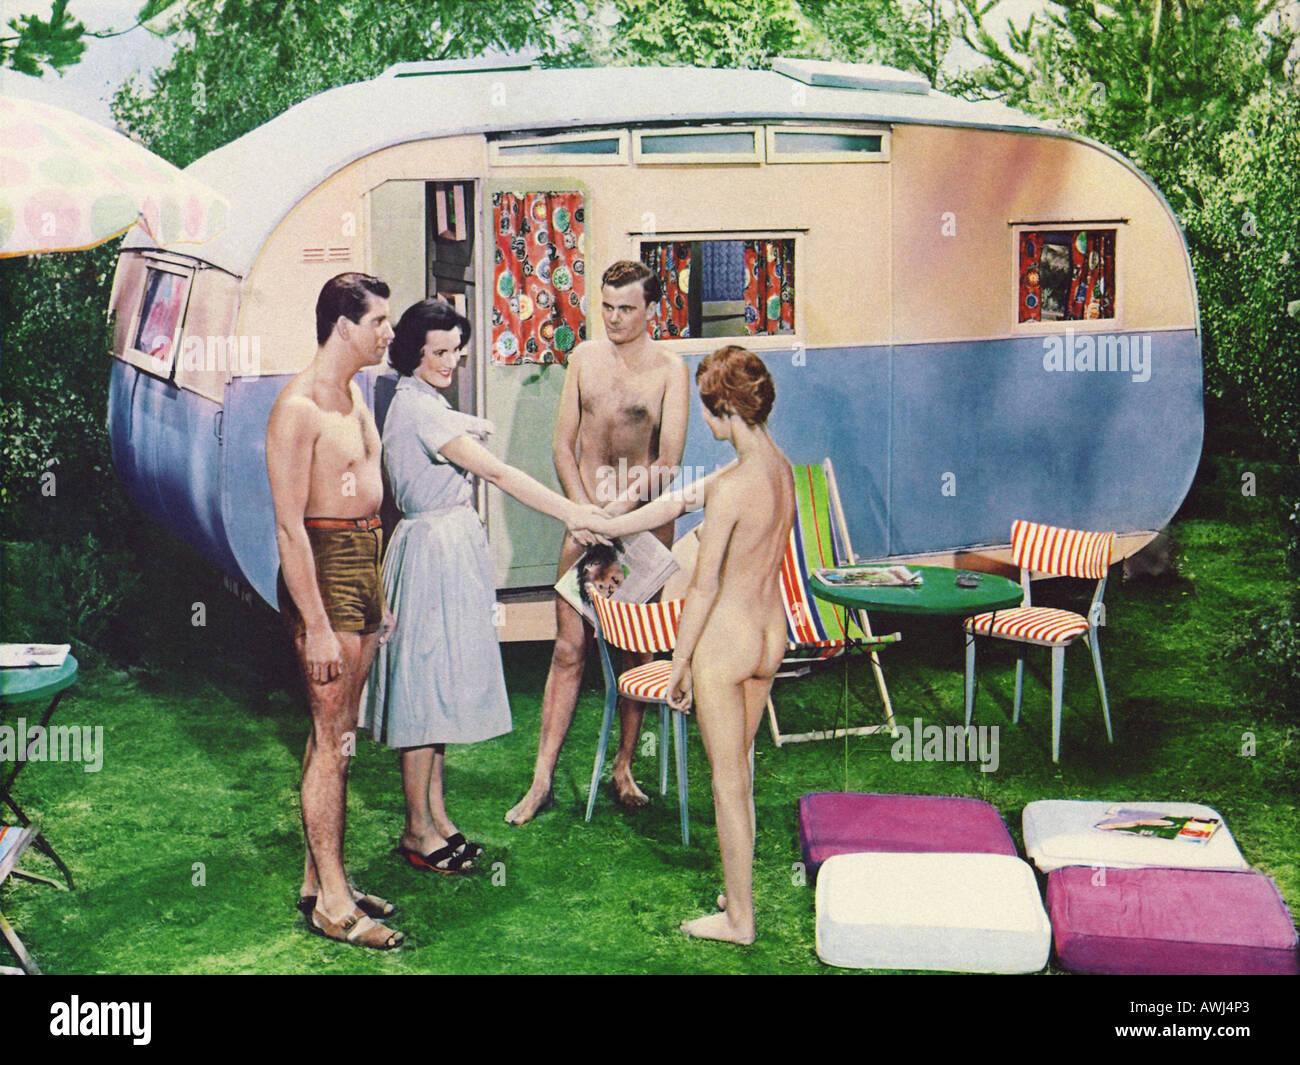 Nudist Family Story